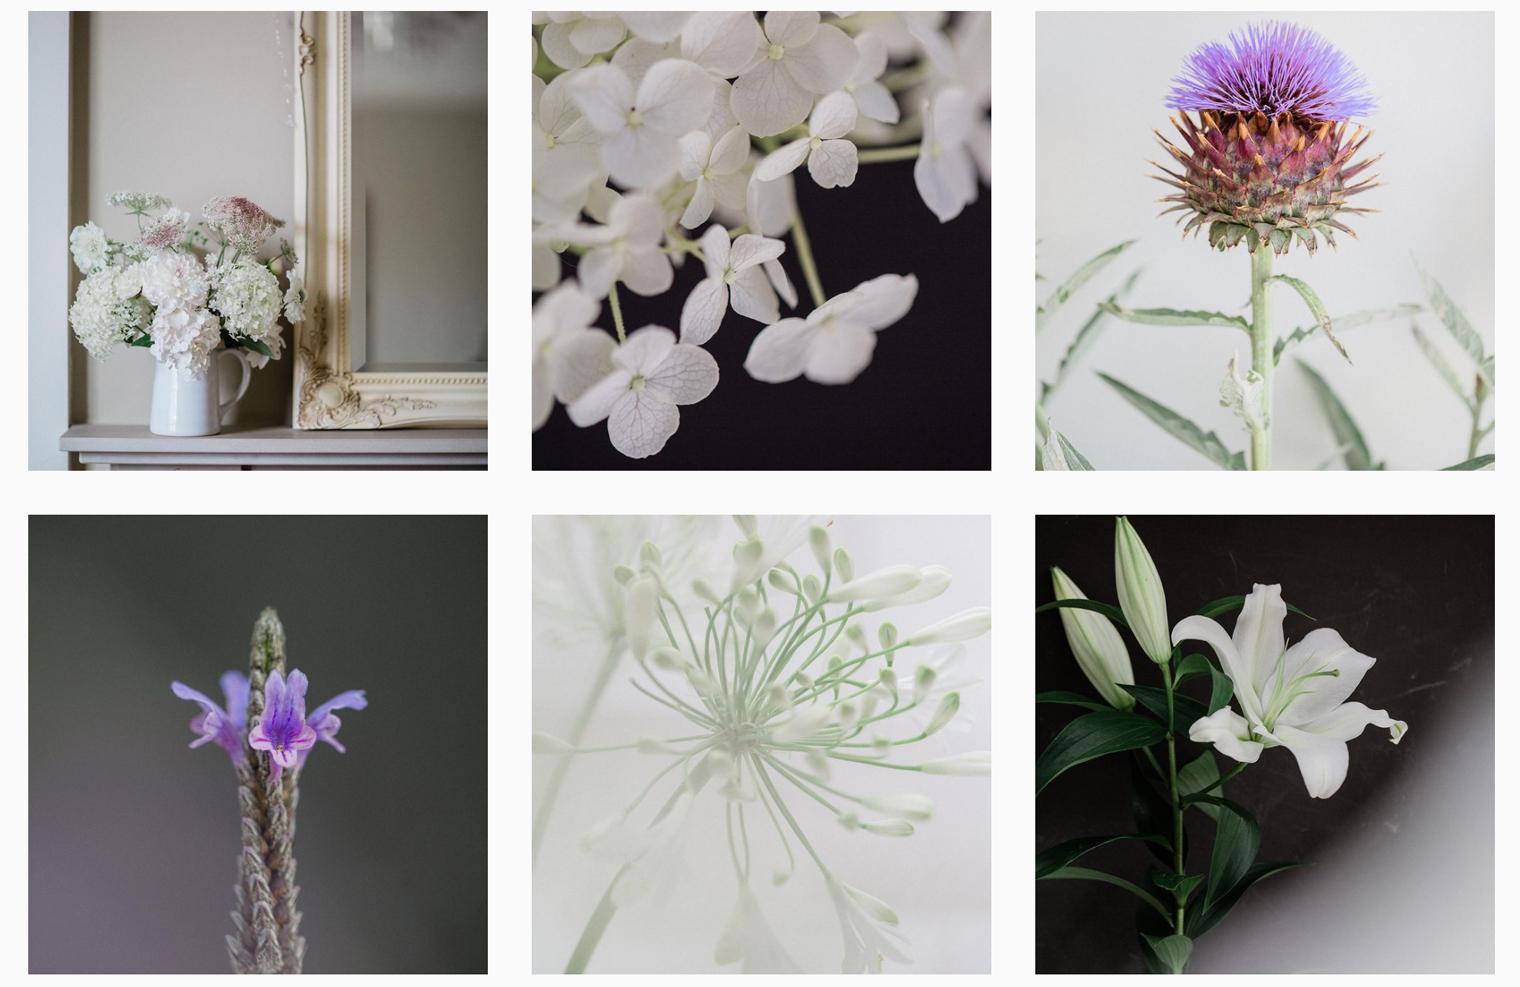 Flowerona Instagram Account